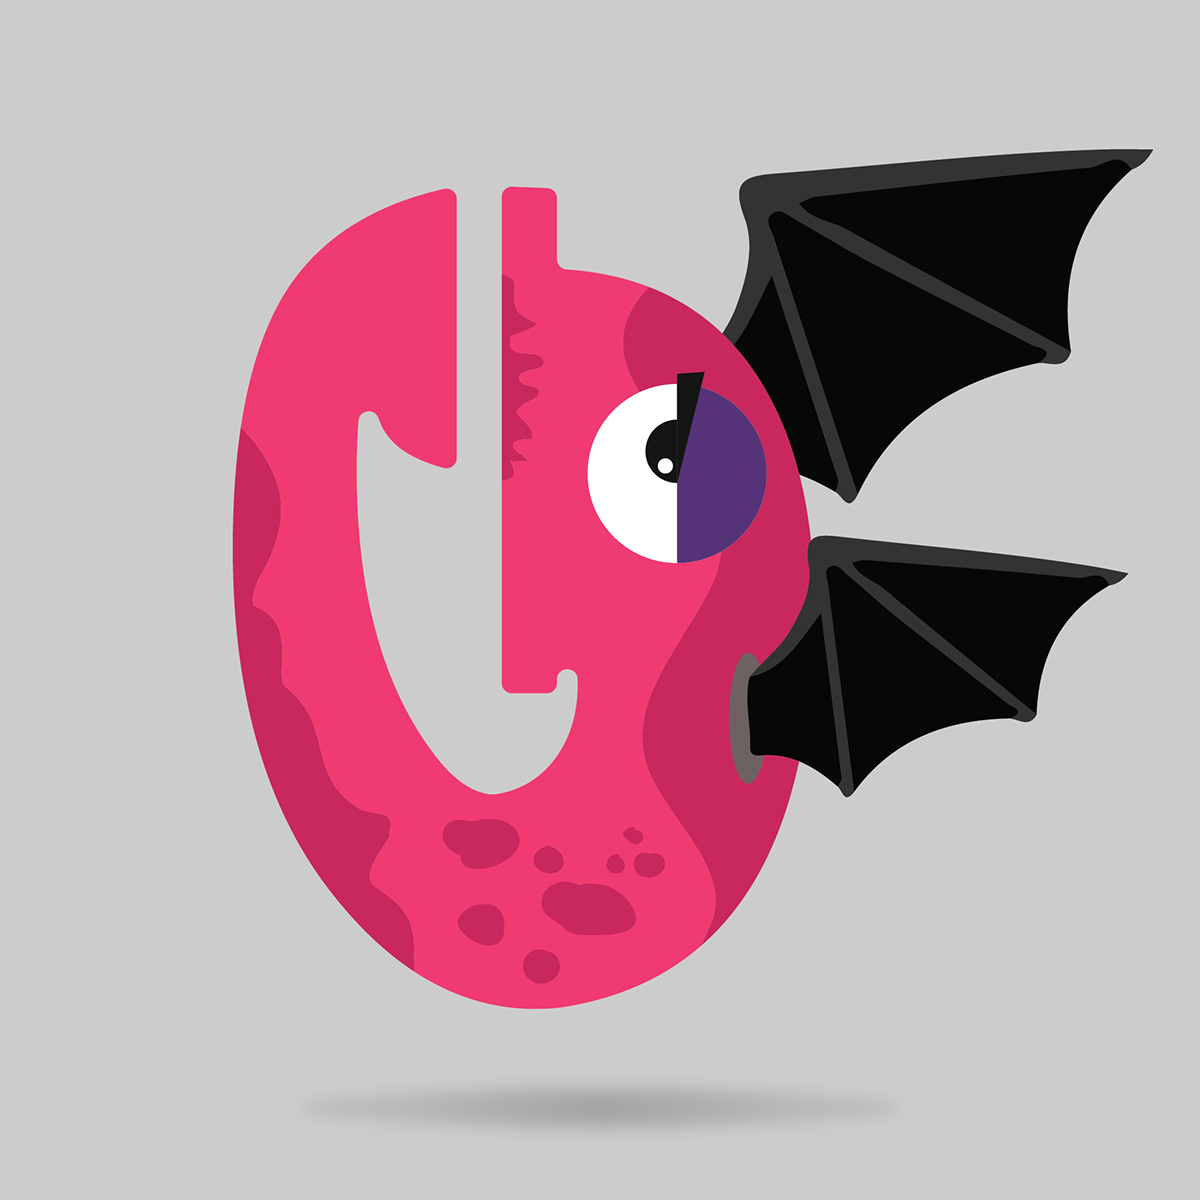 Image may contain: cartoon, illustration and umbrella